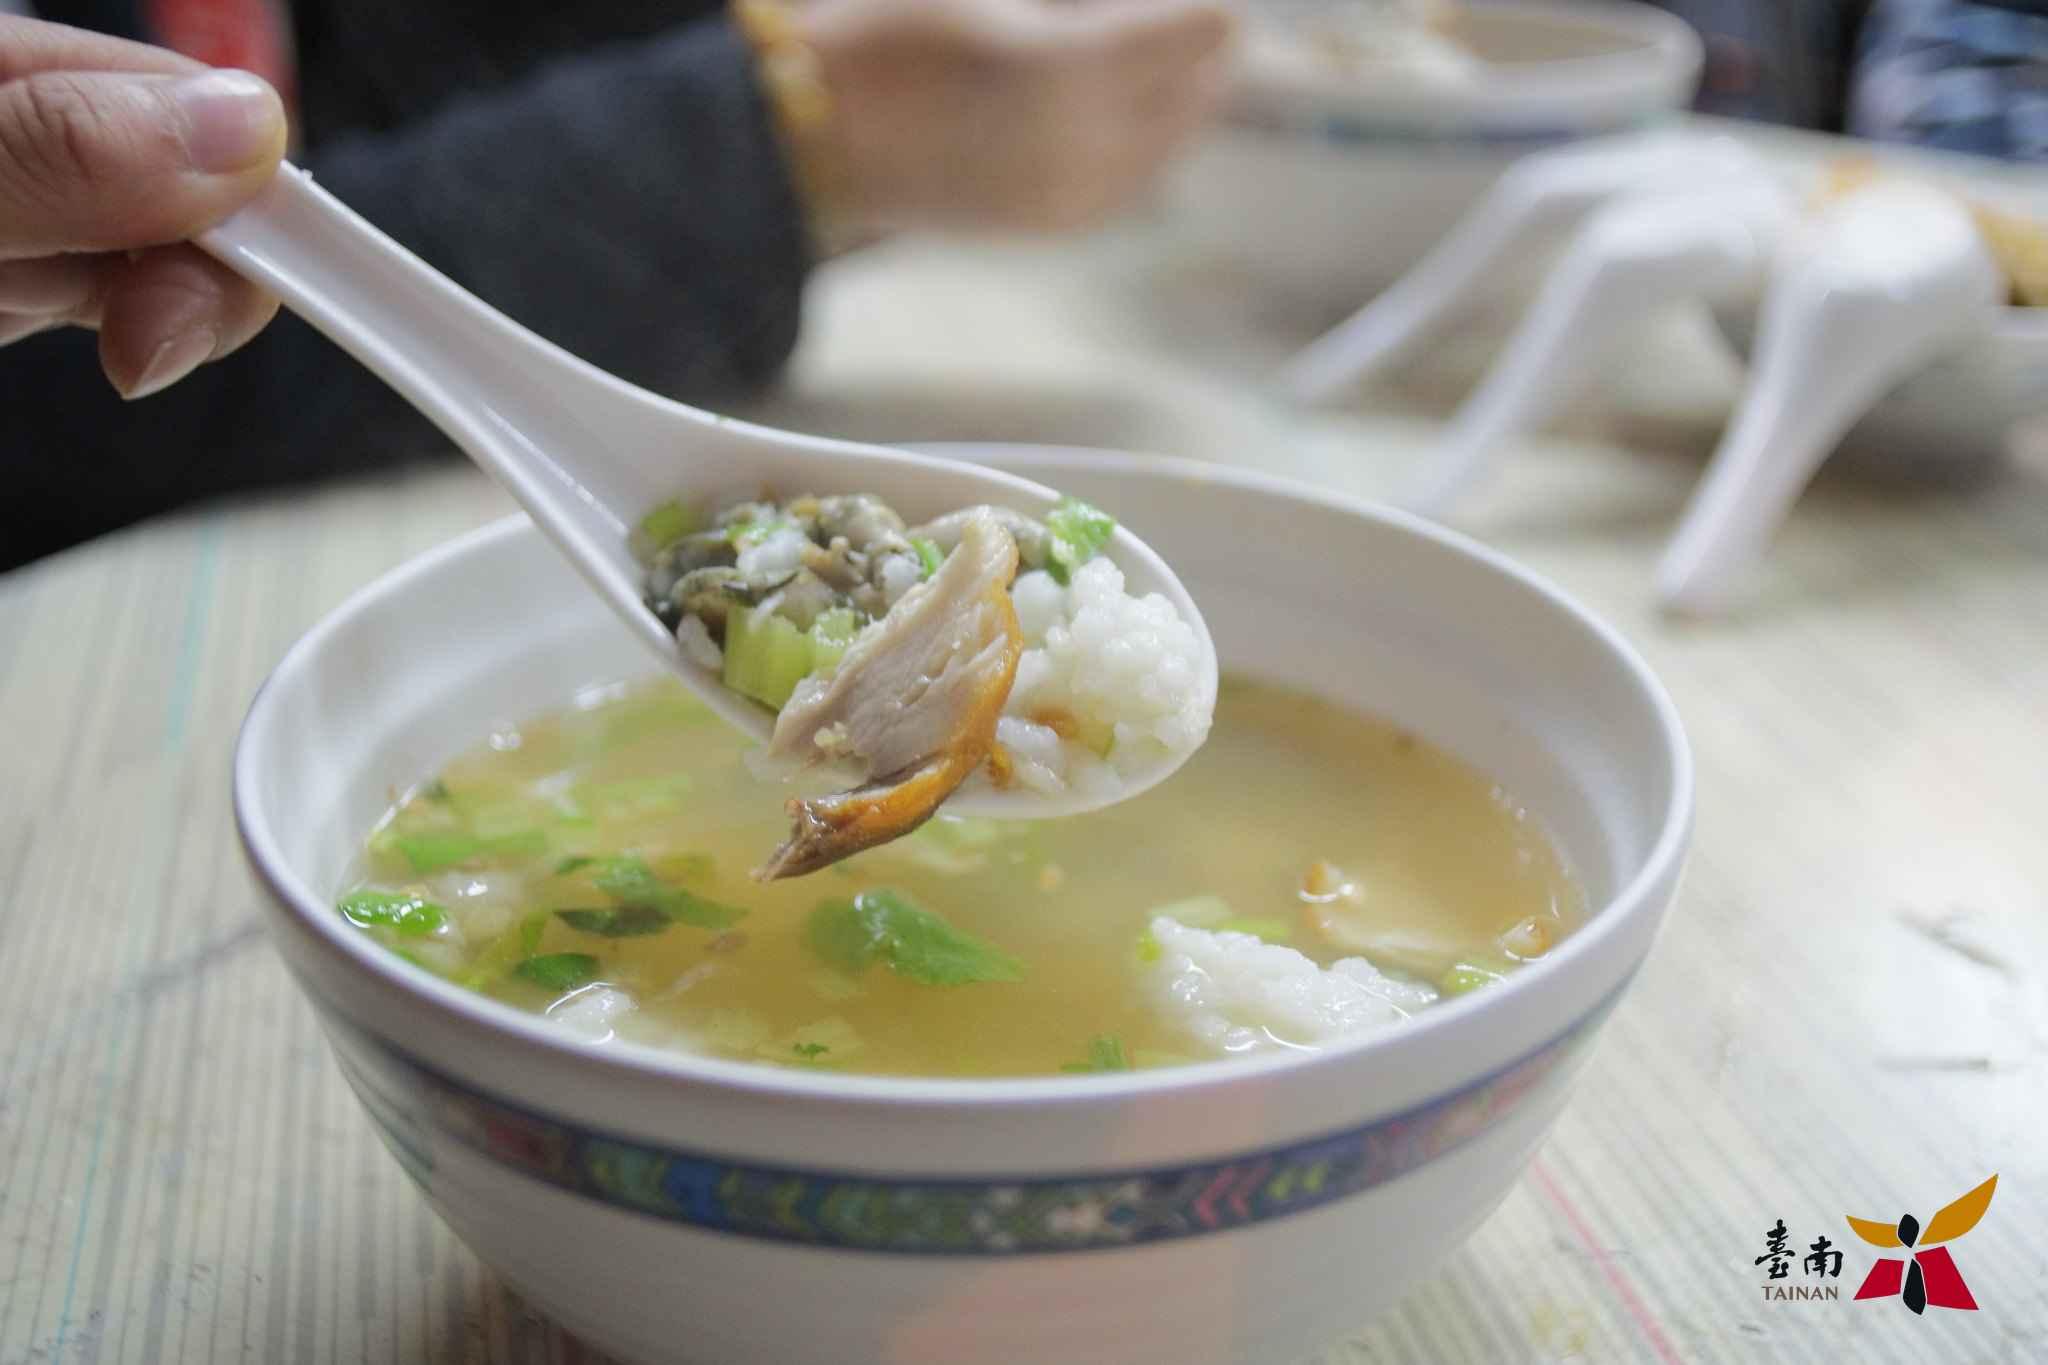 台南 中西區美食- Mytainan - 23